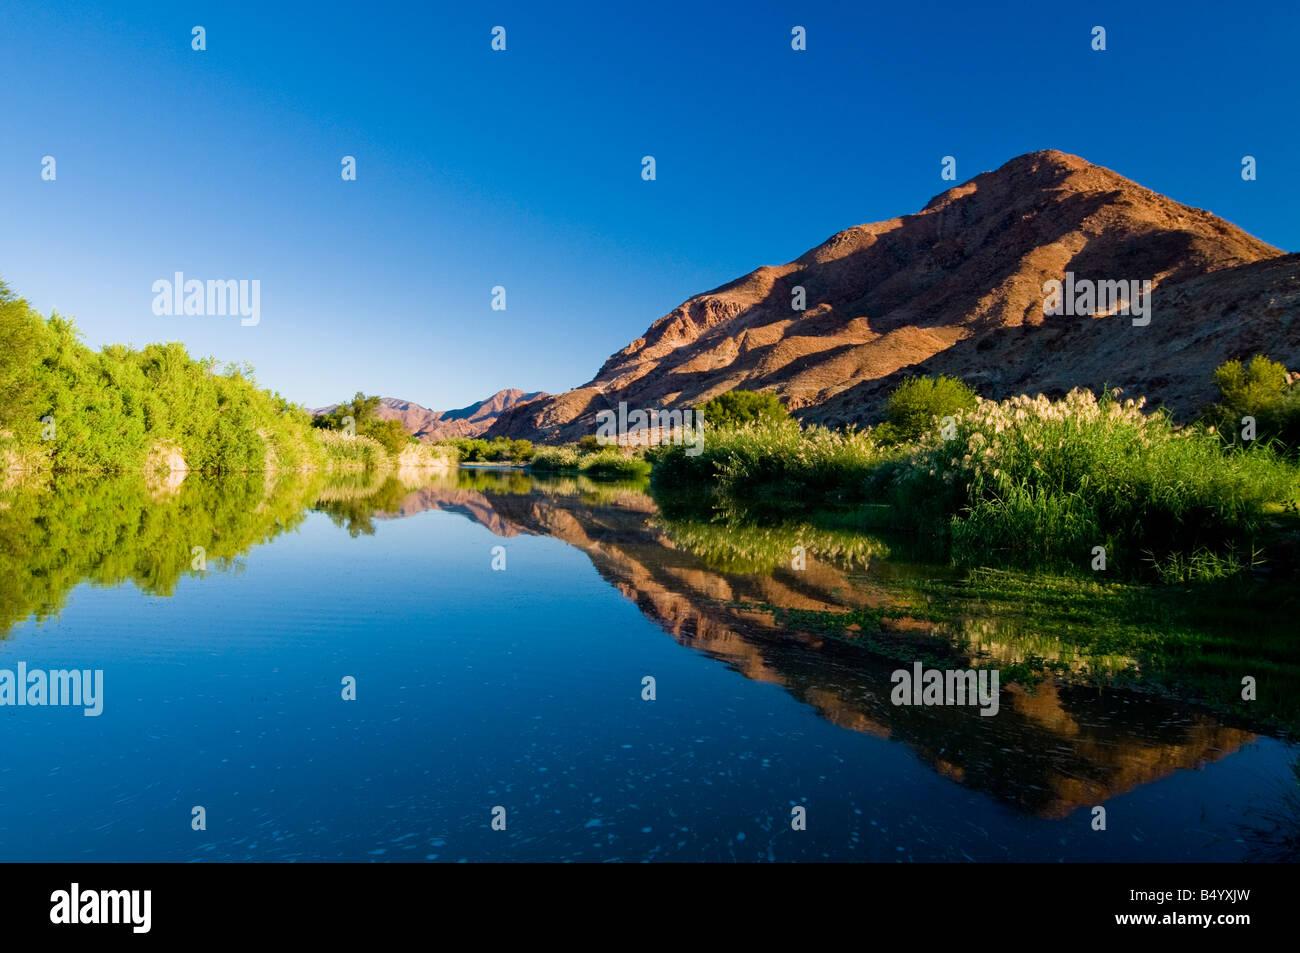 Oranje River, Richtersveld national park, Northern Cape, South Africa - Stock Image